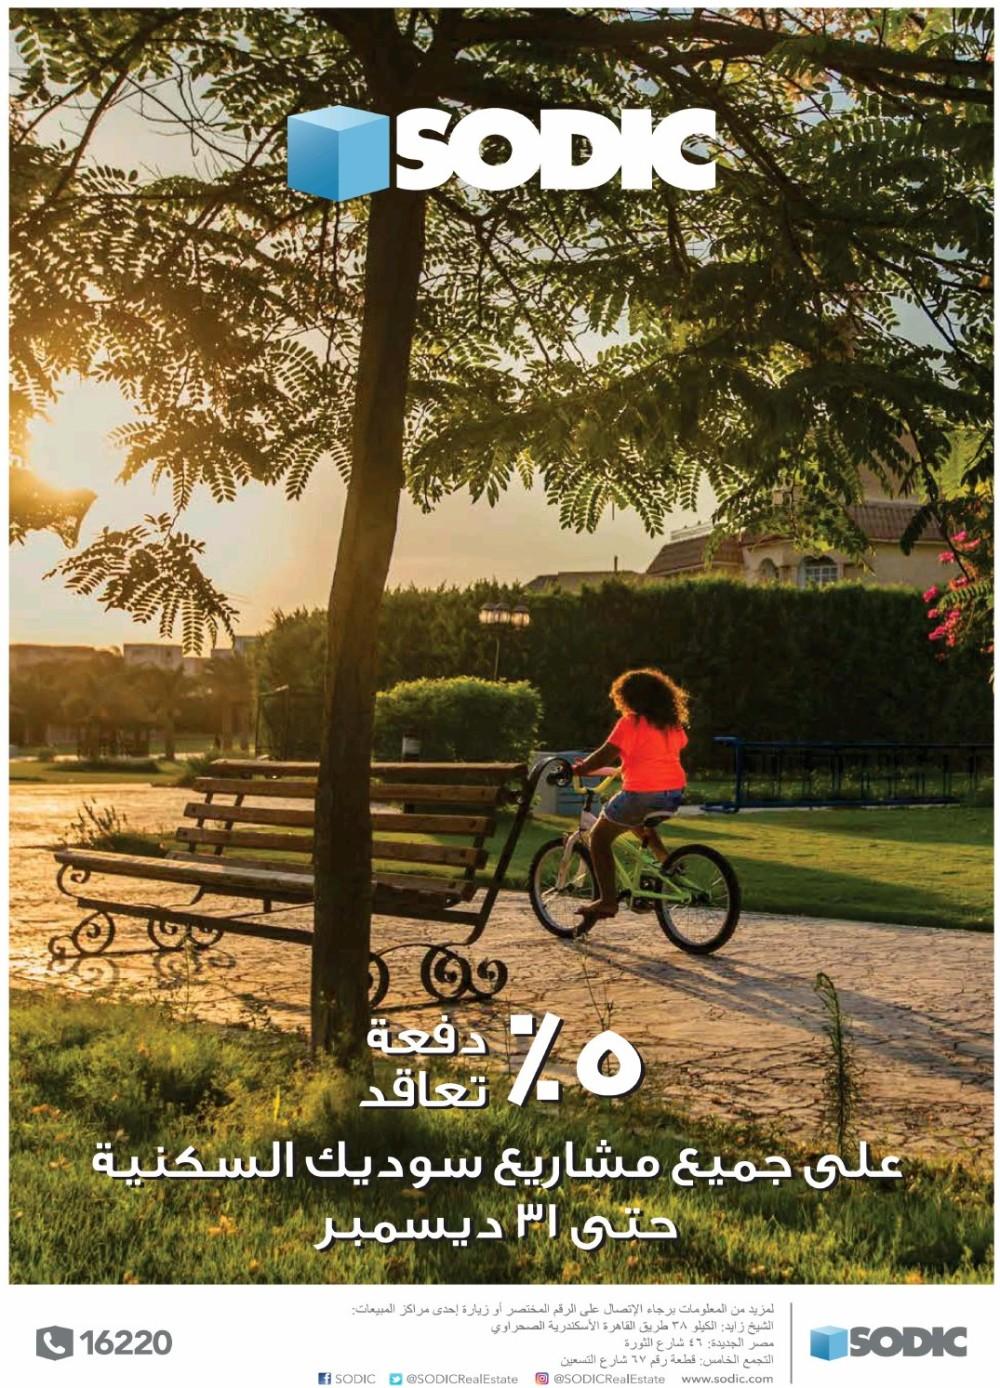 Islamic finance, Zakat, Waqf – Islamic Ads Network